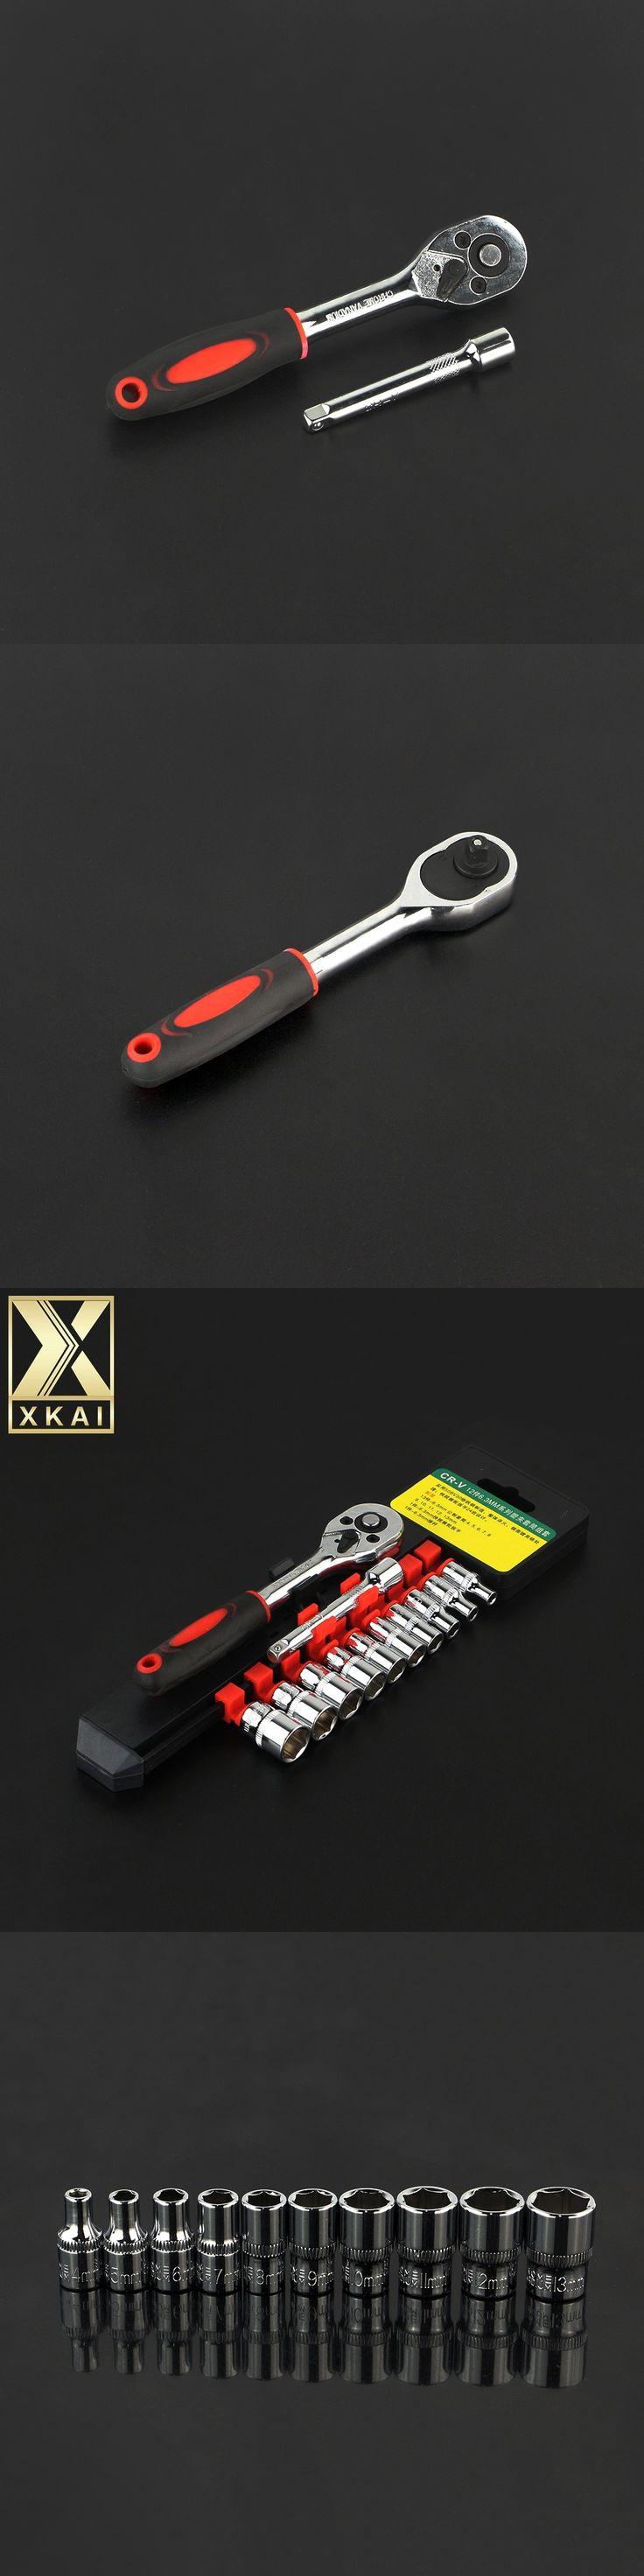 "XKAI 12 pieces 1/4"" 4-13mm Socket Wrench head metric socket set kit bolt hexagon allen torque wrench with Rubber handle tools"